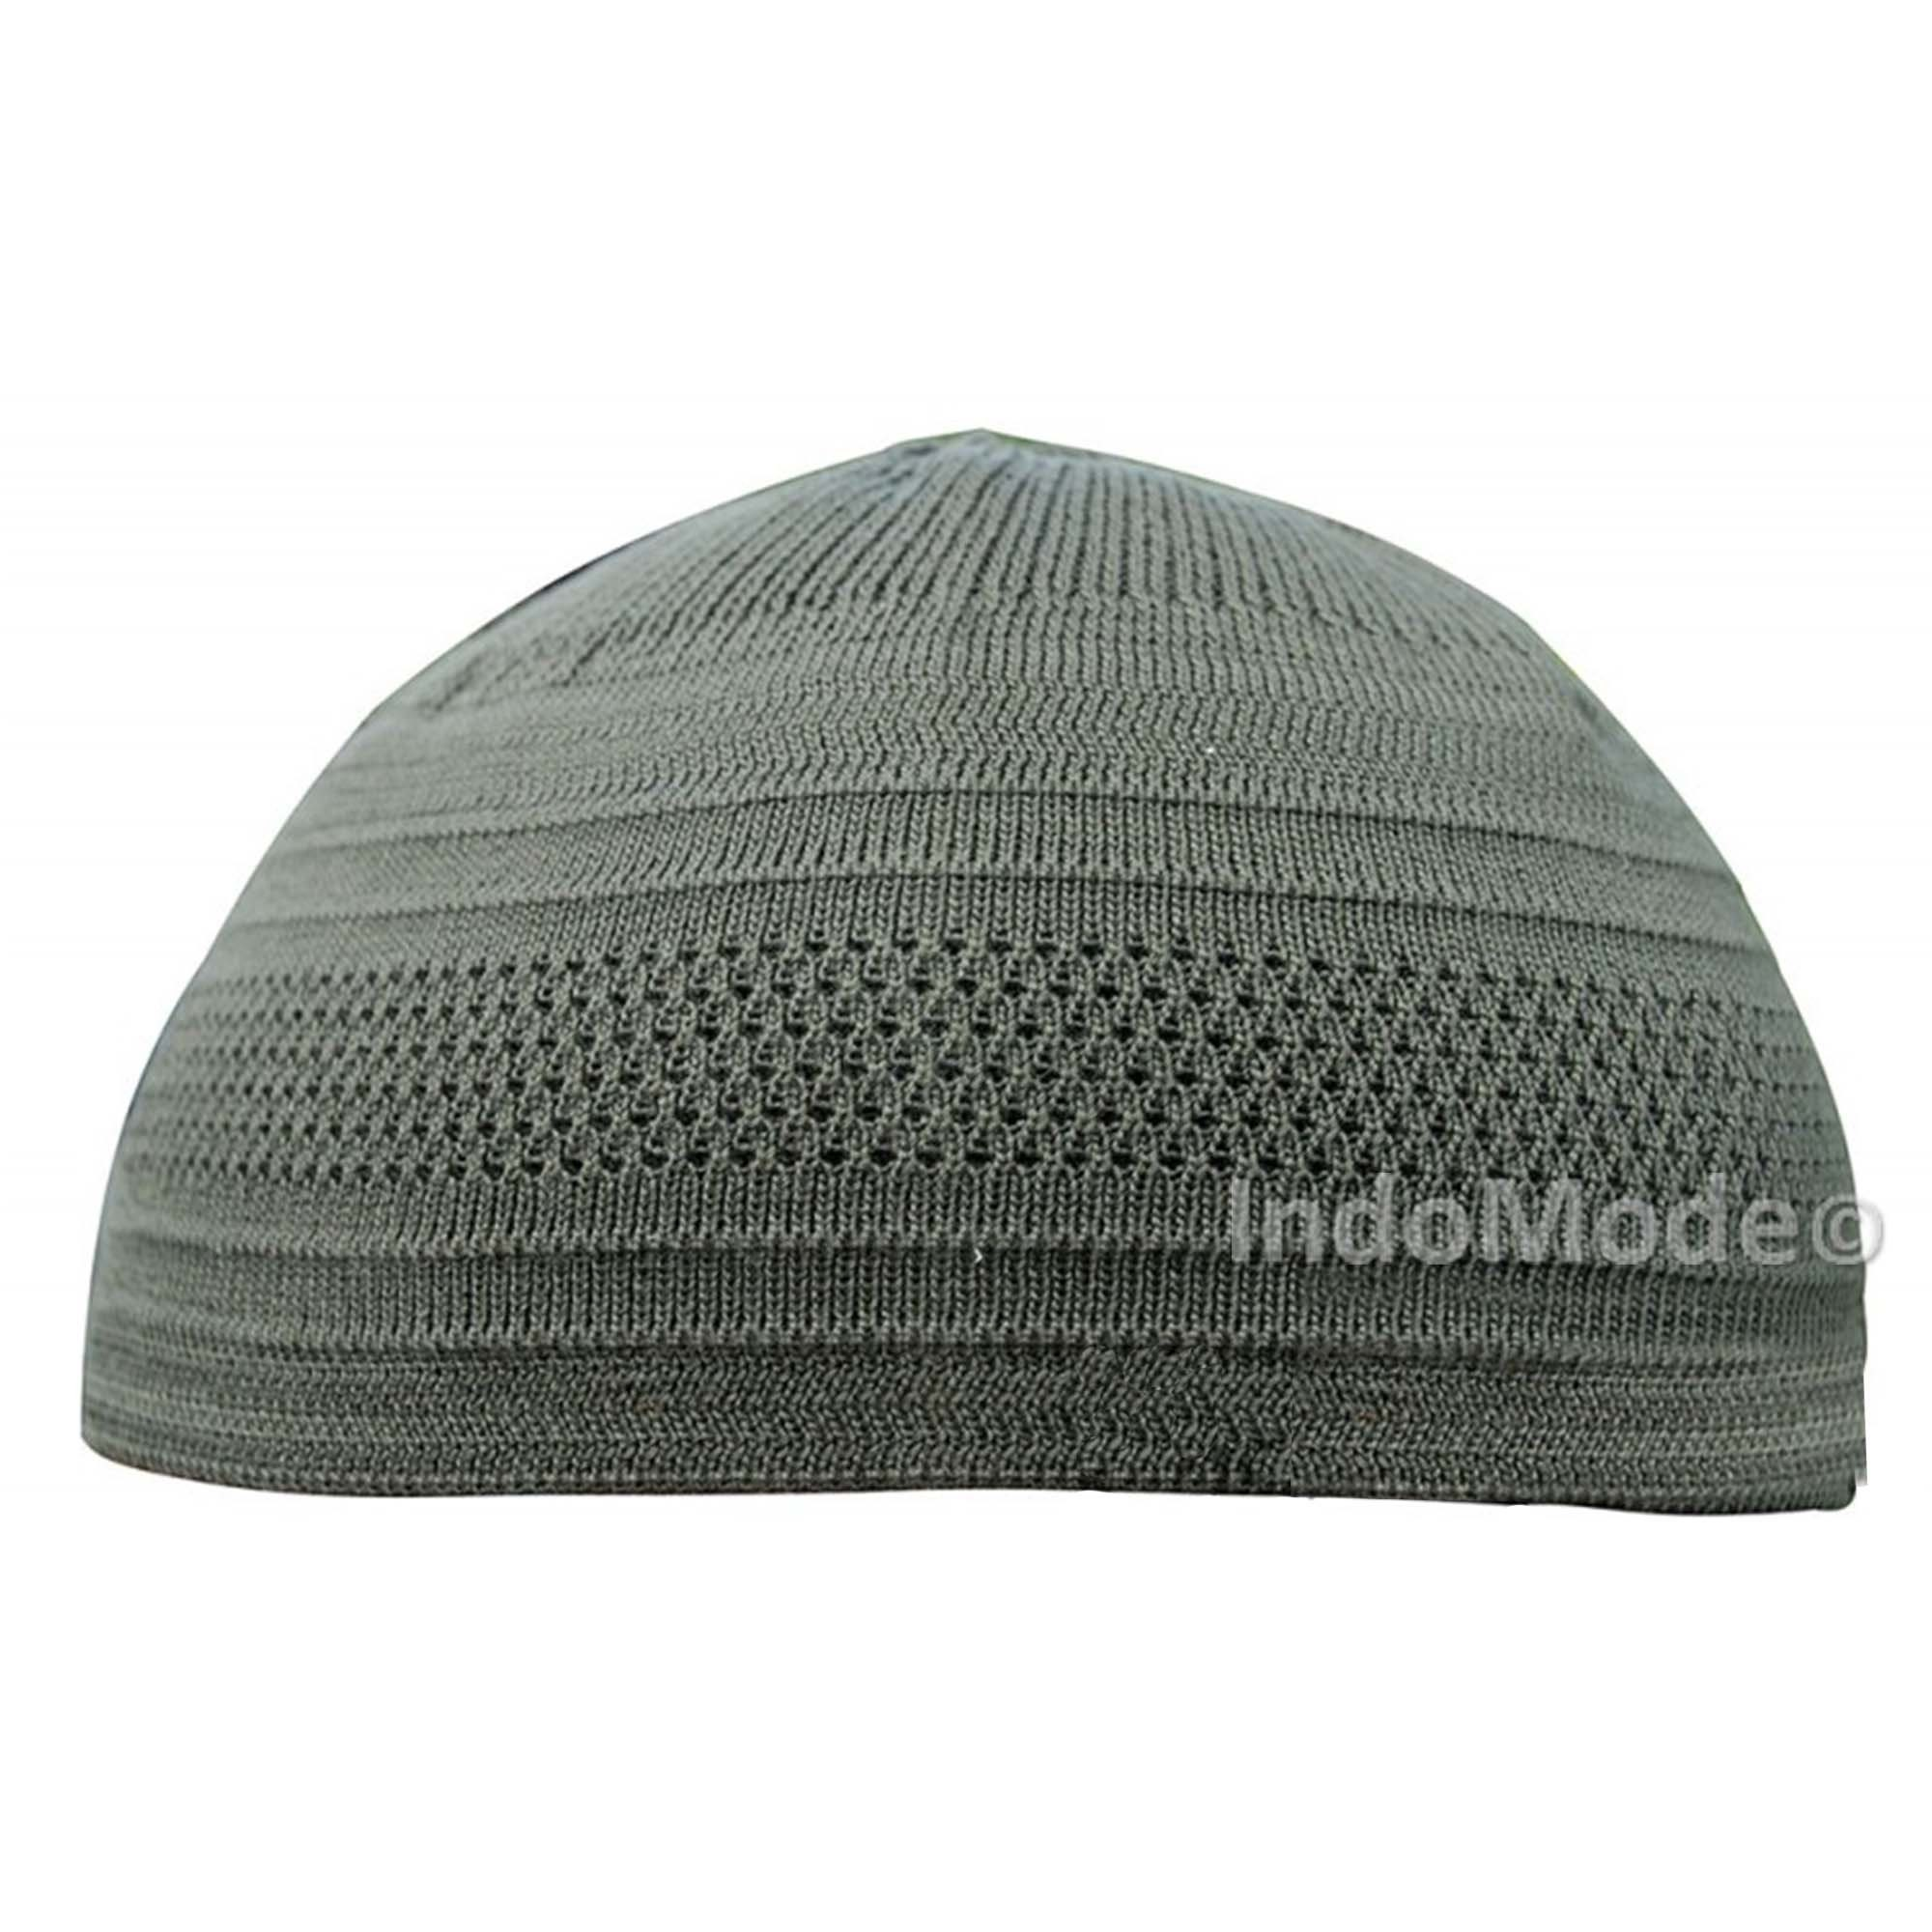 TheKufi Dark Olive Green Cotton Stretch-knit Kufi Hat Skull  3464e82689b7